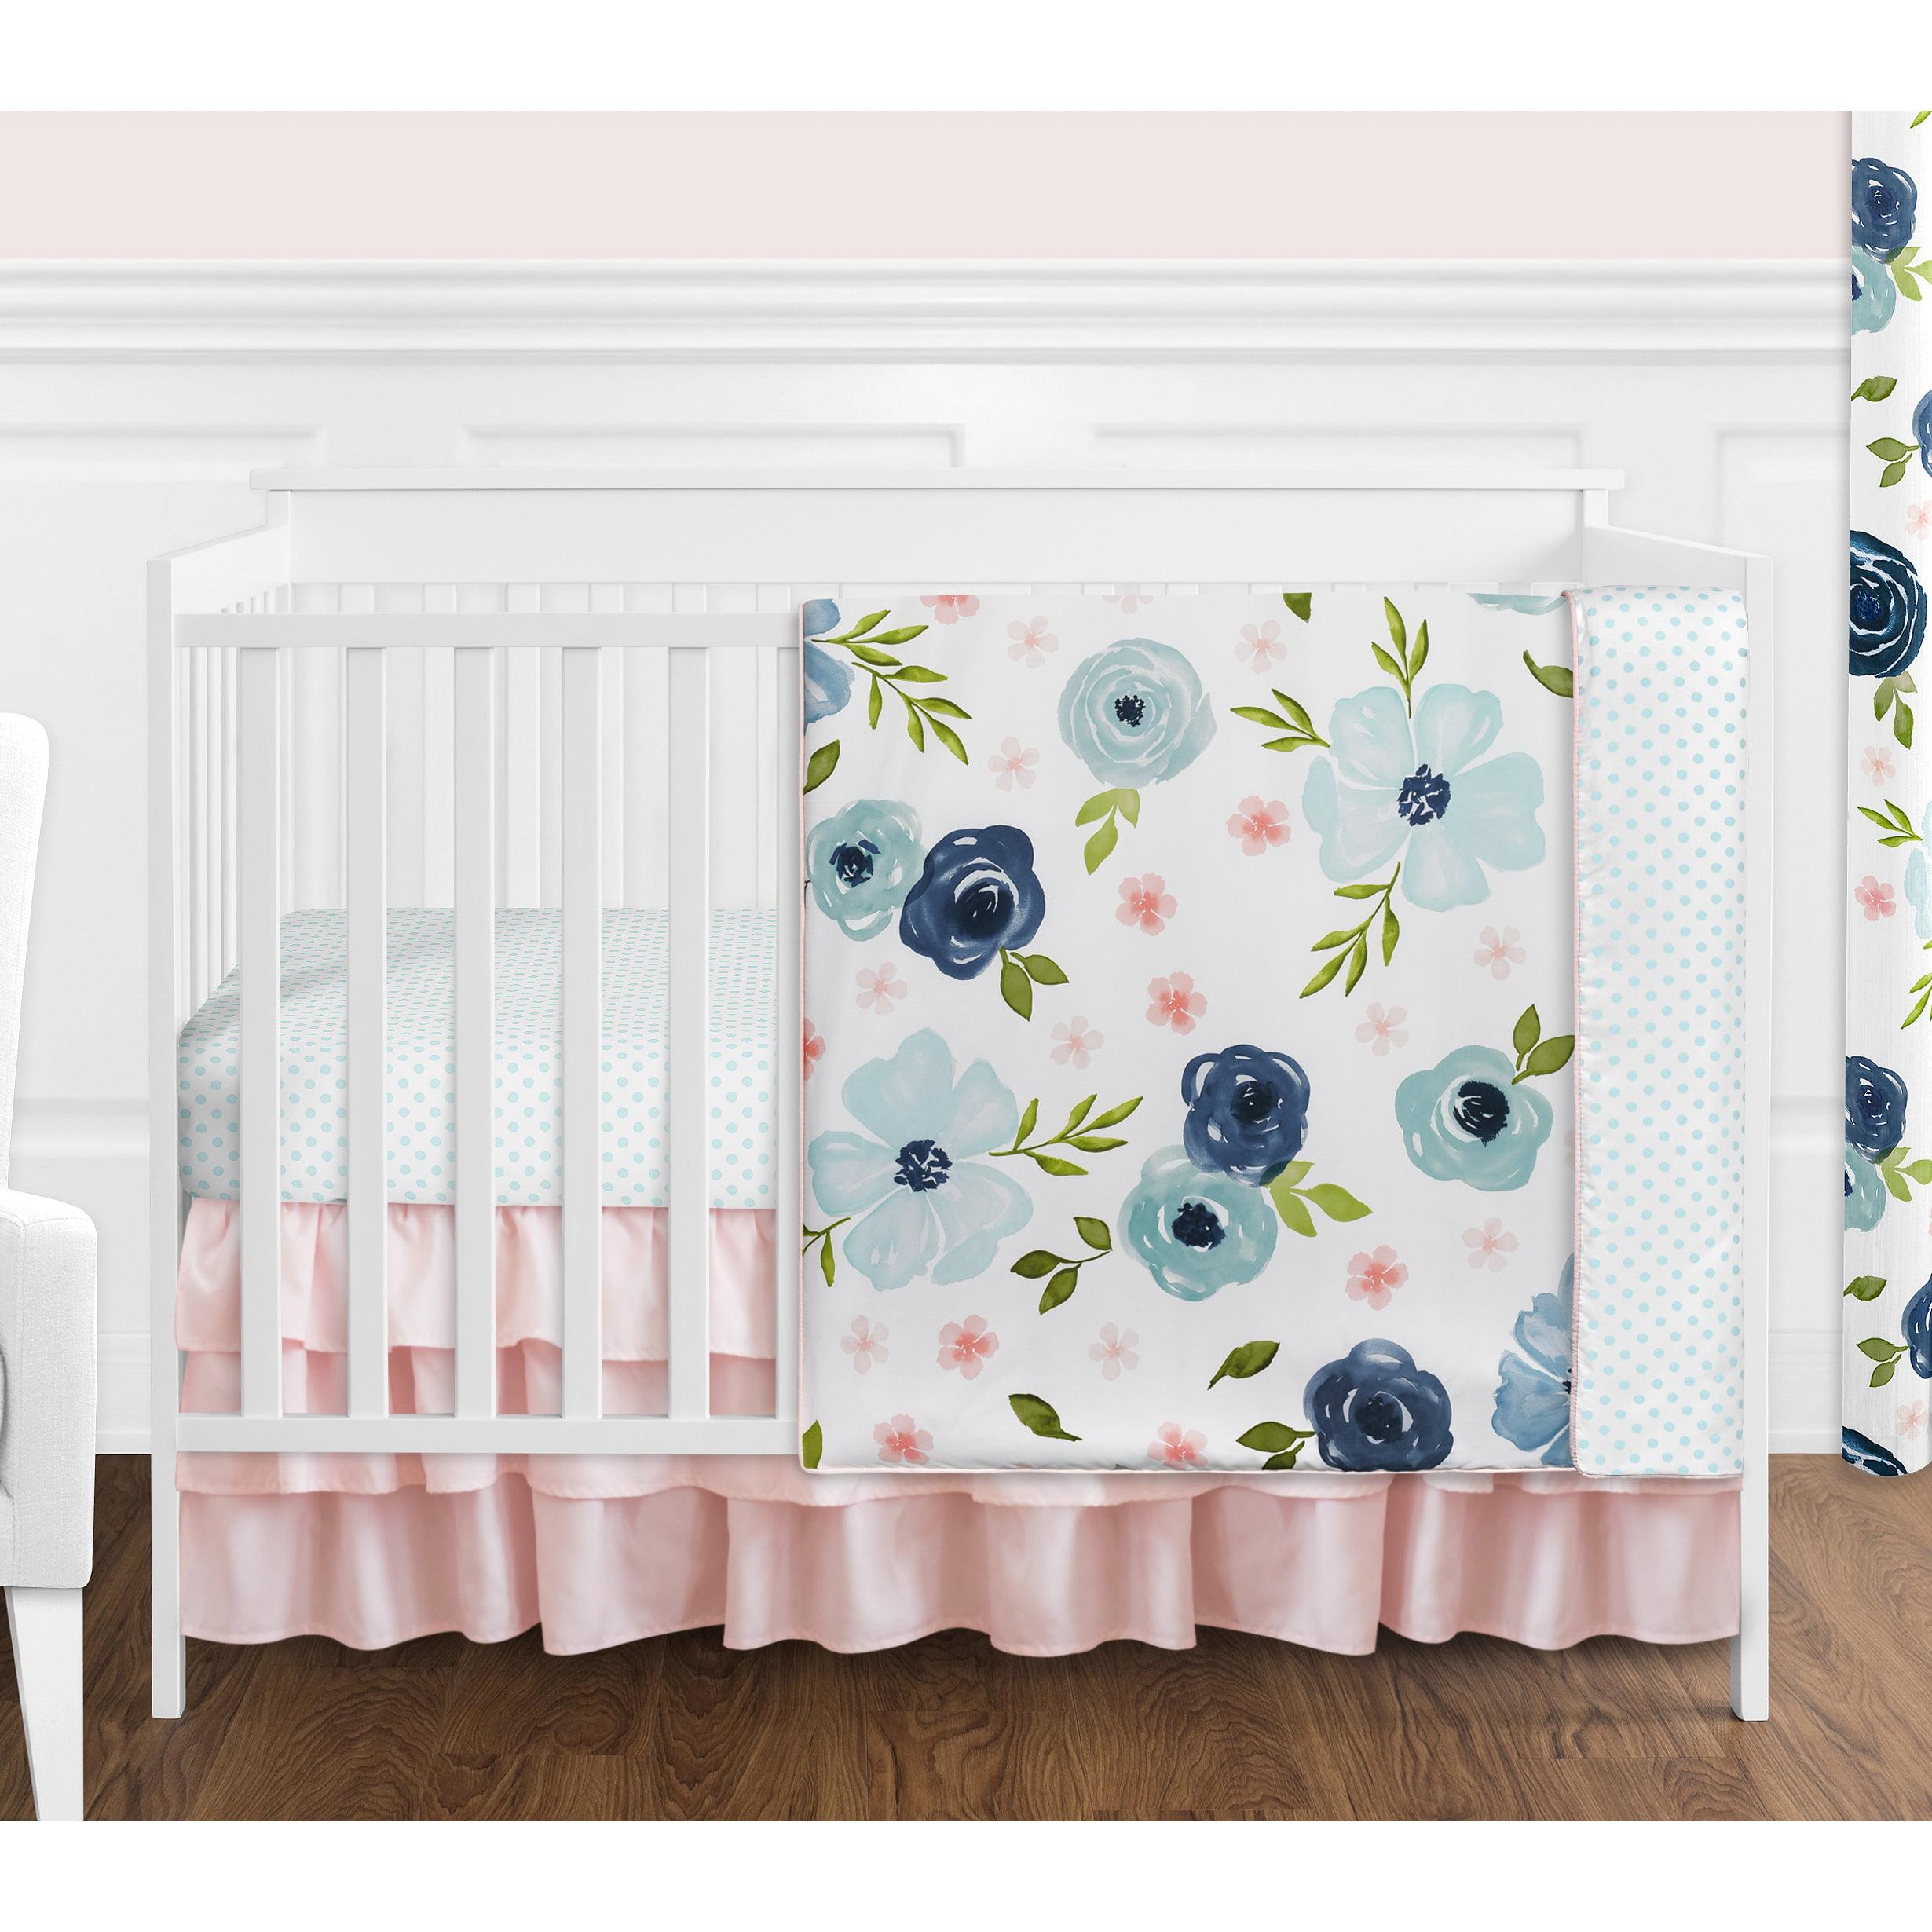 Pink purple floral crib bedding Vintage floral Sweet girls crib sheet Kids bedding Pink blue Floral Toddler pillowcase Boppy cover Lilac